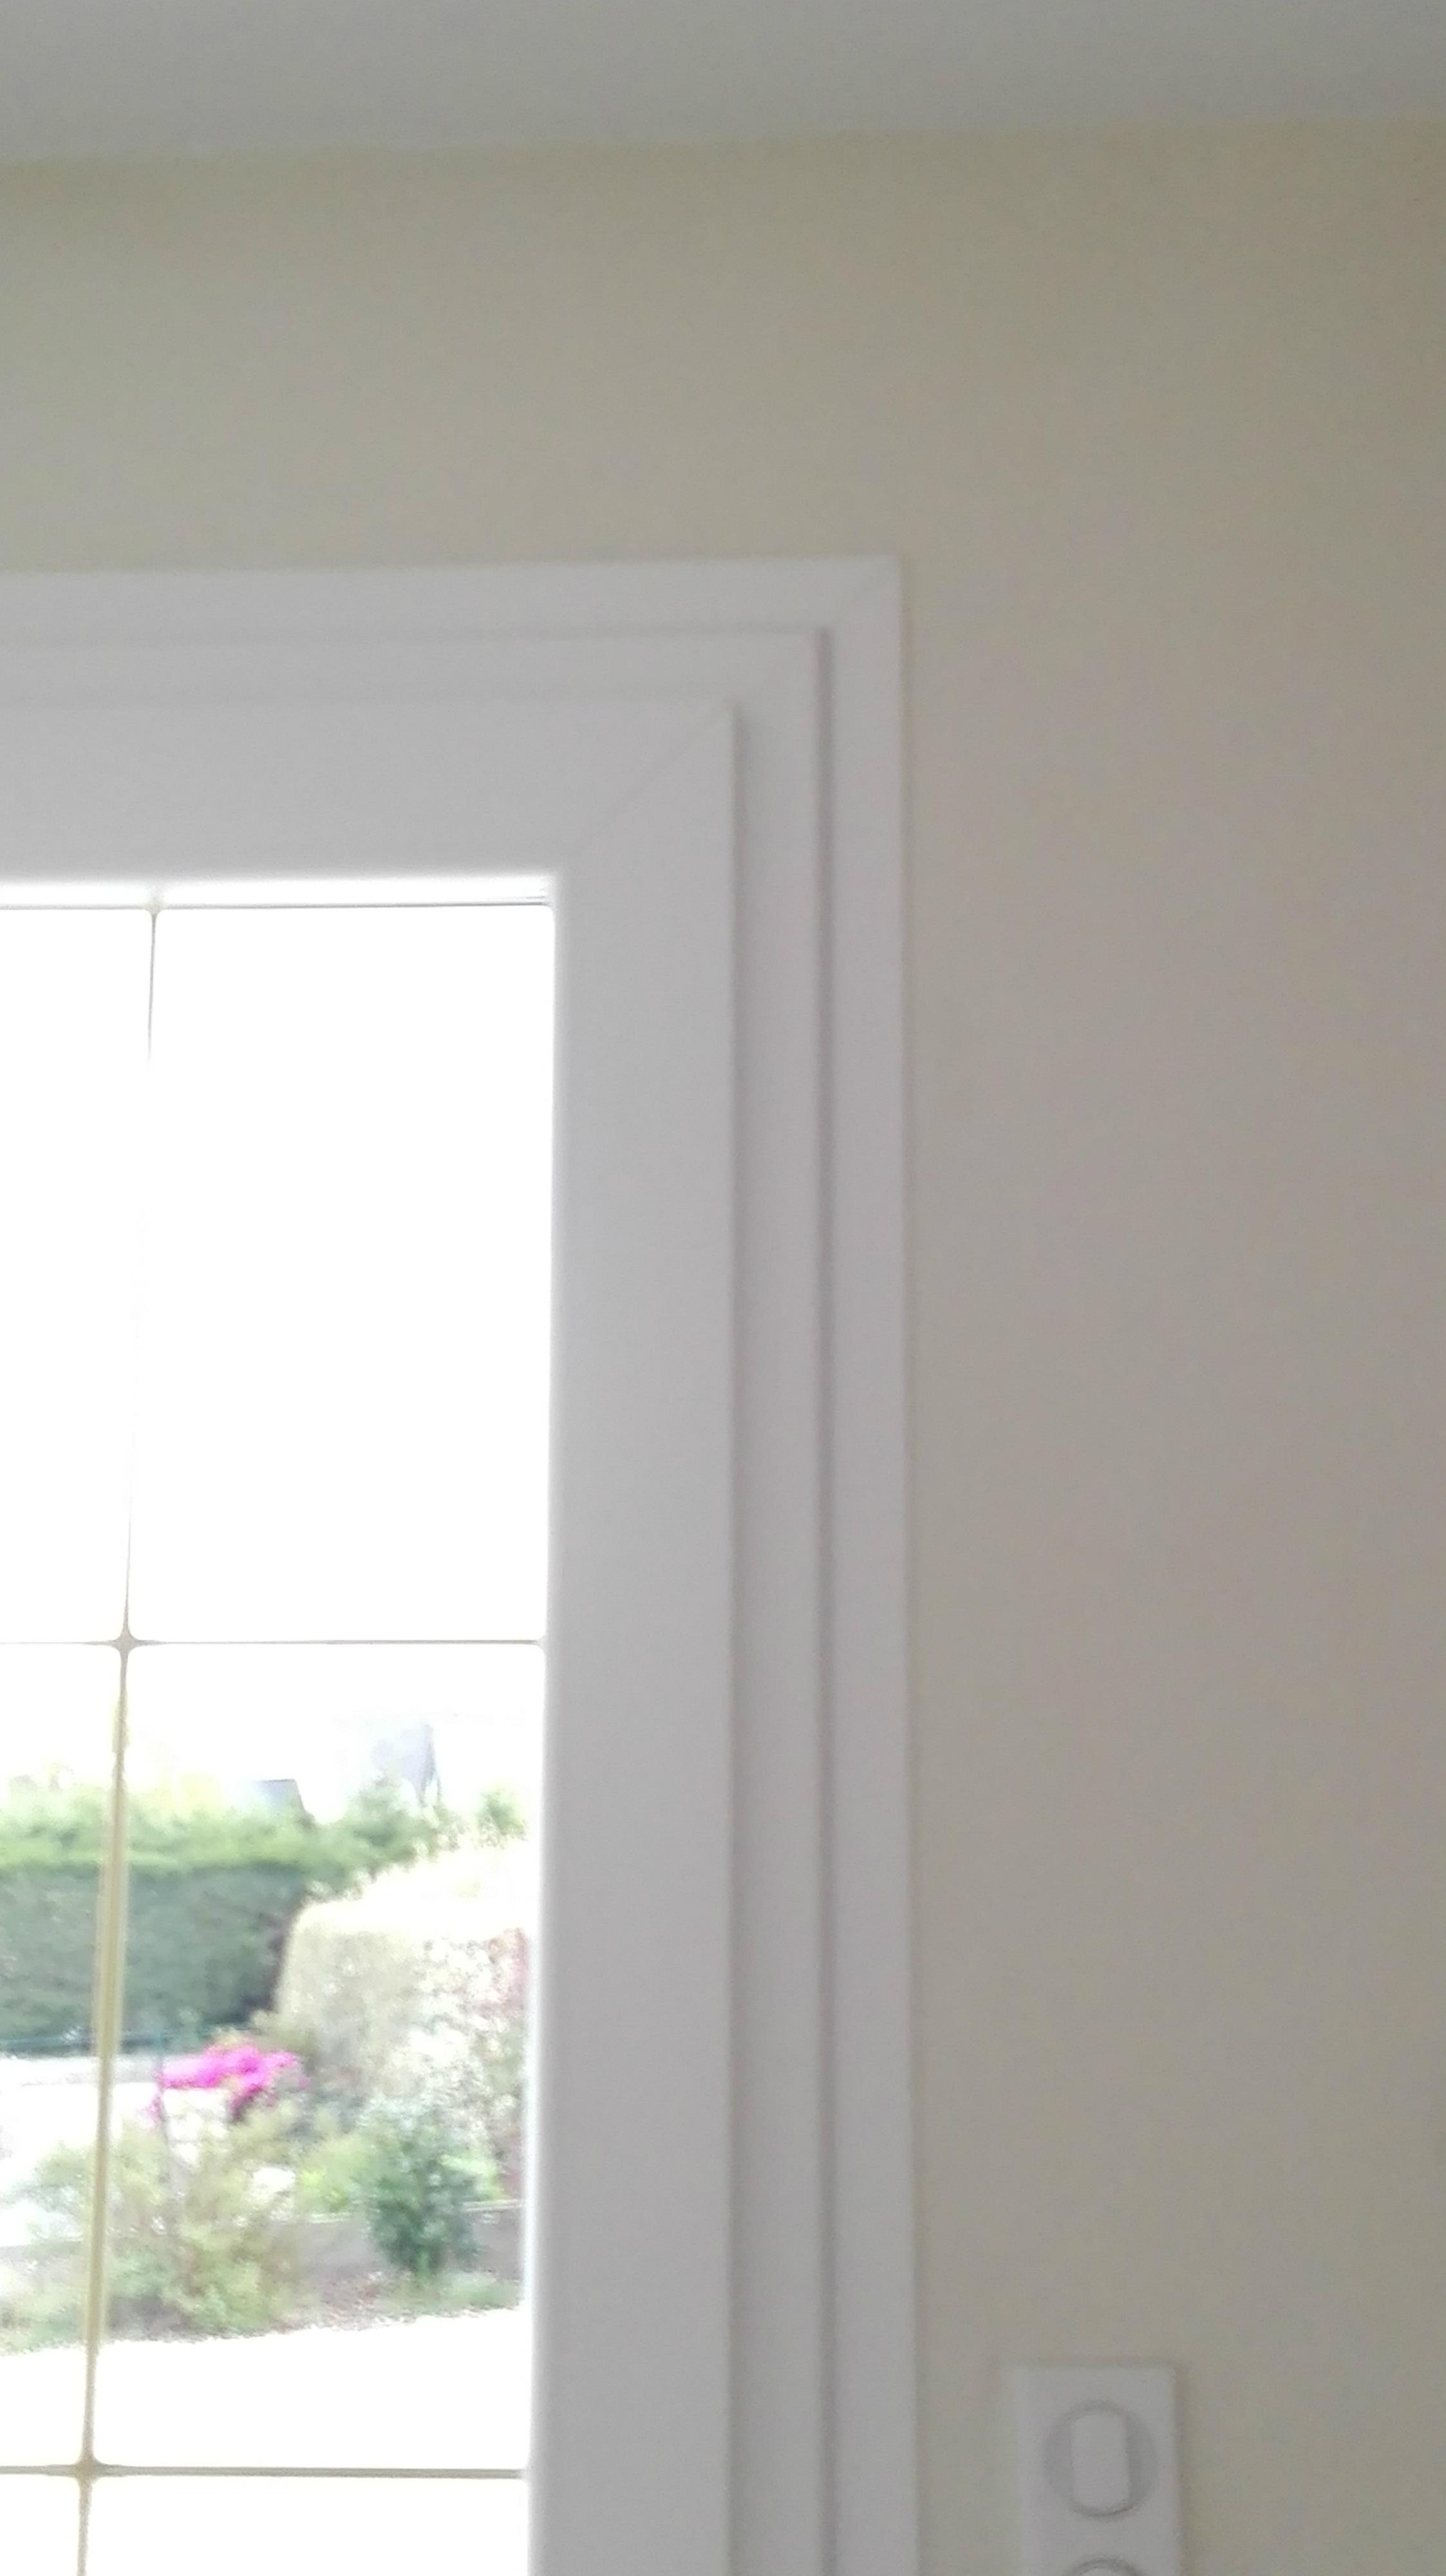 Installation de portes d 39 entr e pvc blanc vein gouesnou for Porte interieure en pvc blanc